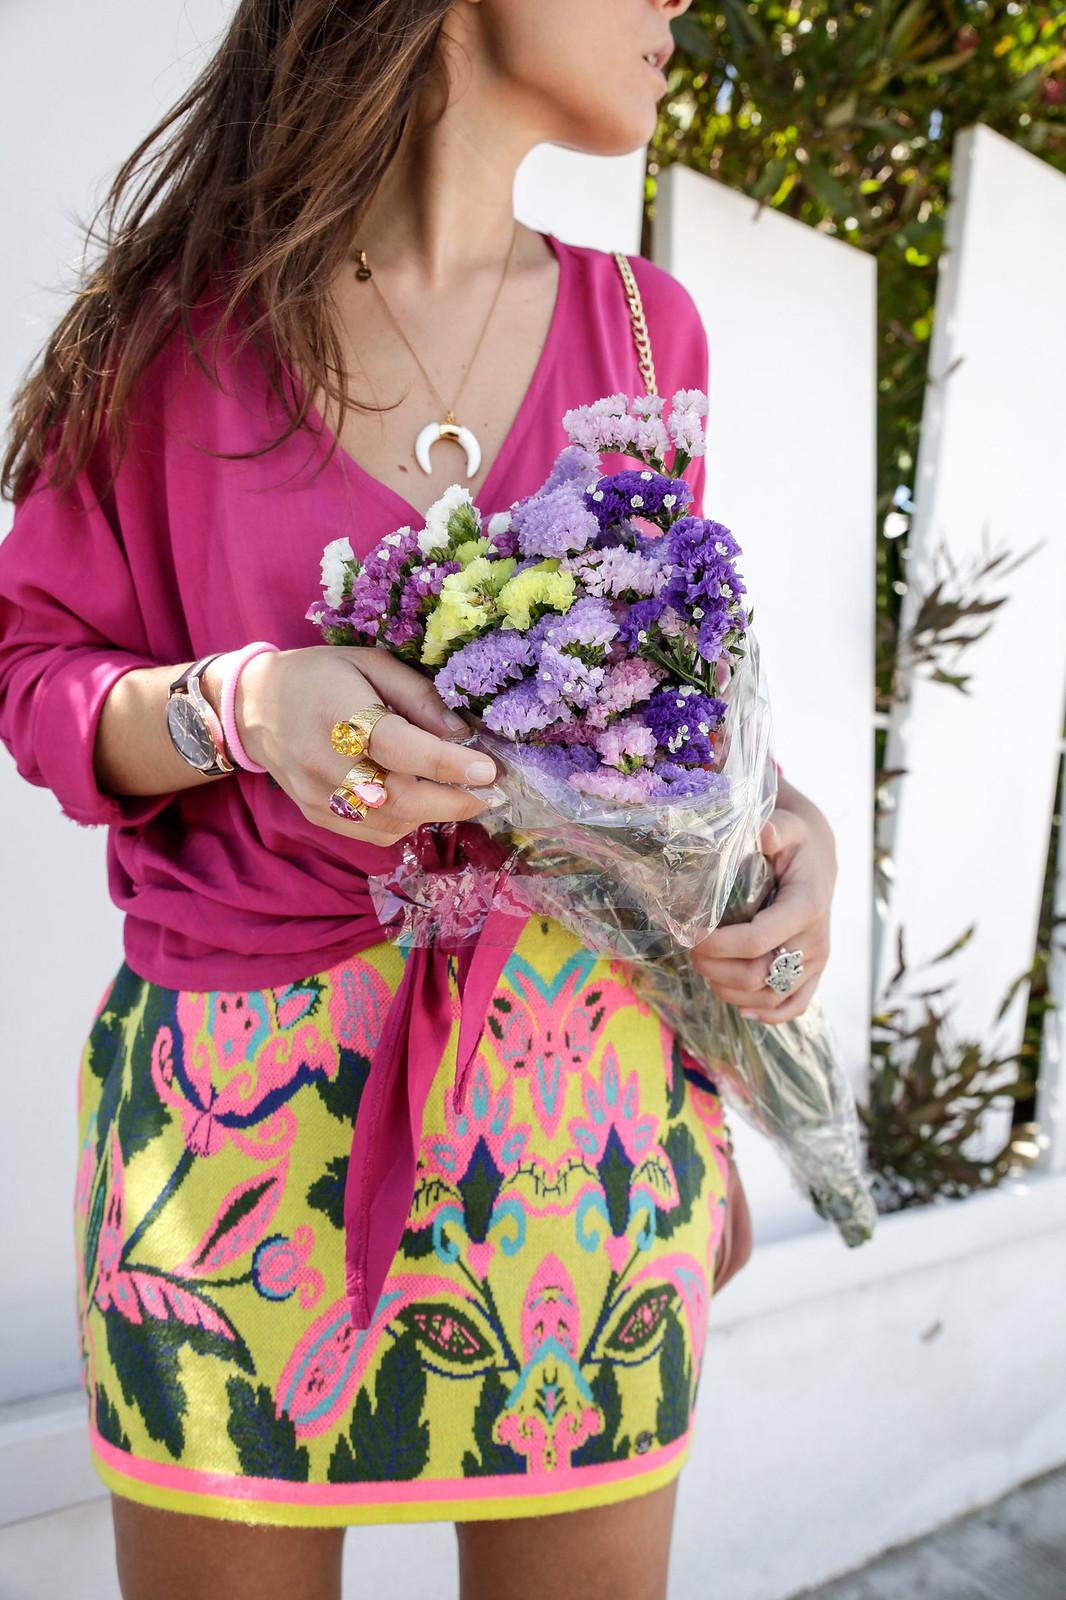 03_blusa_magenta_falda_amarilla_outfit_ruga_summer17_theguestgirl_influencer_barcelona_portugal_brand_ambassador